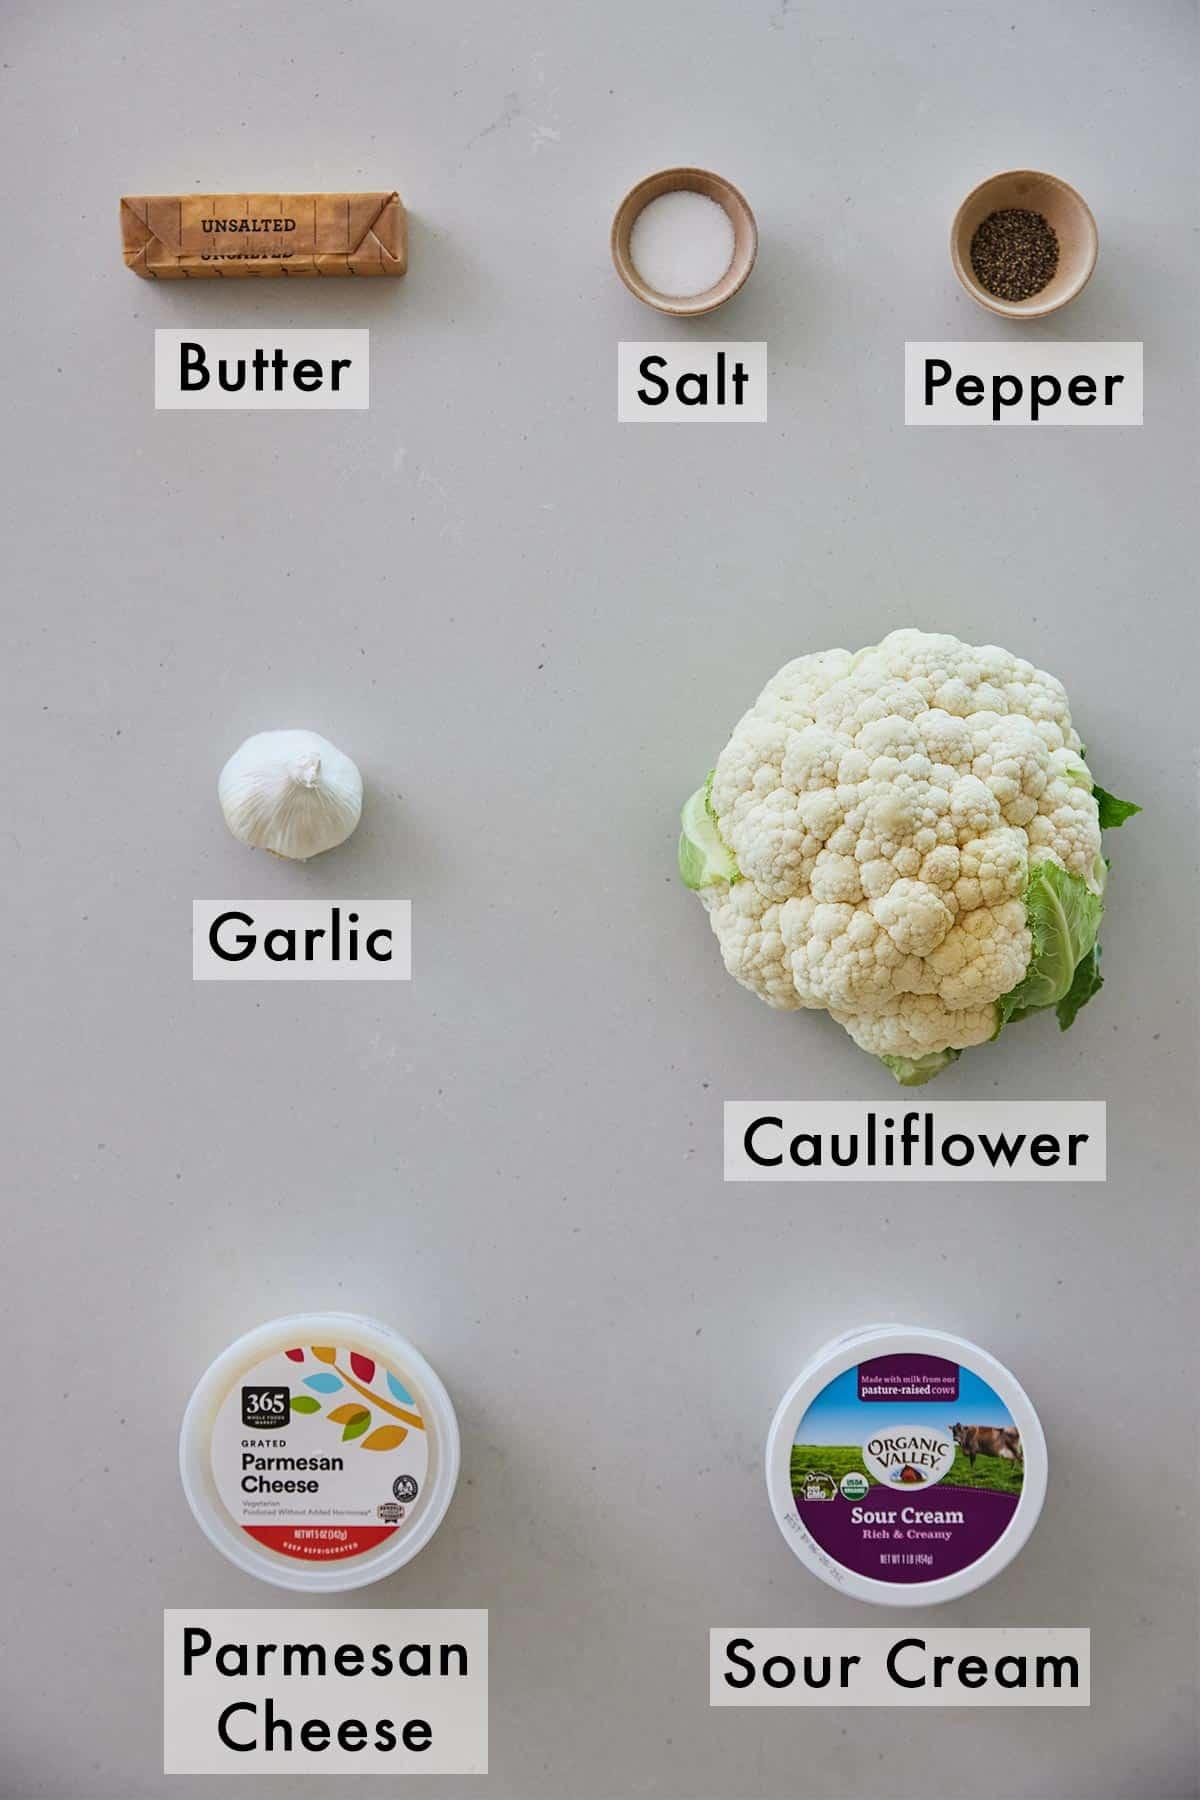 Ingredients needed to make mashed cauliflower.